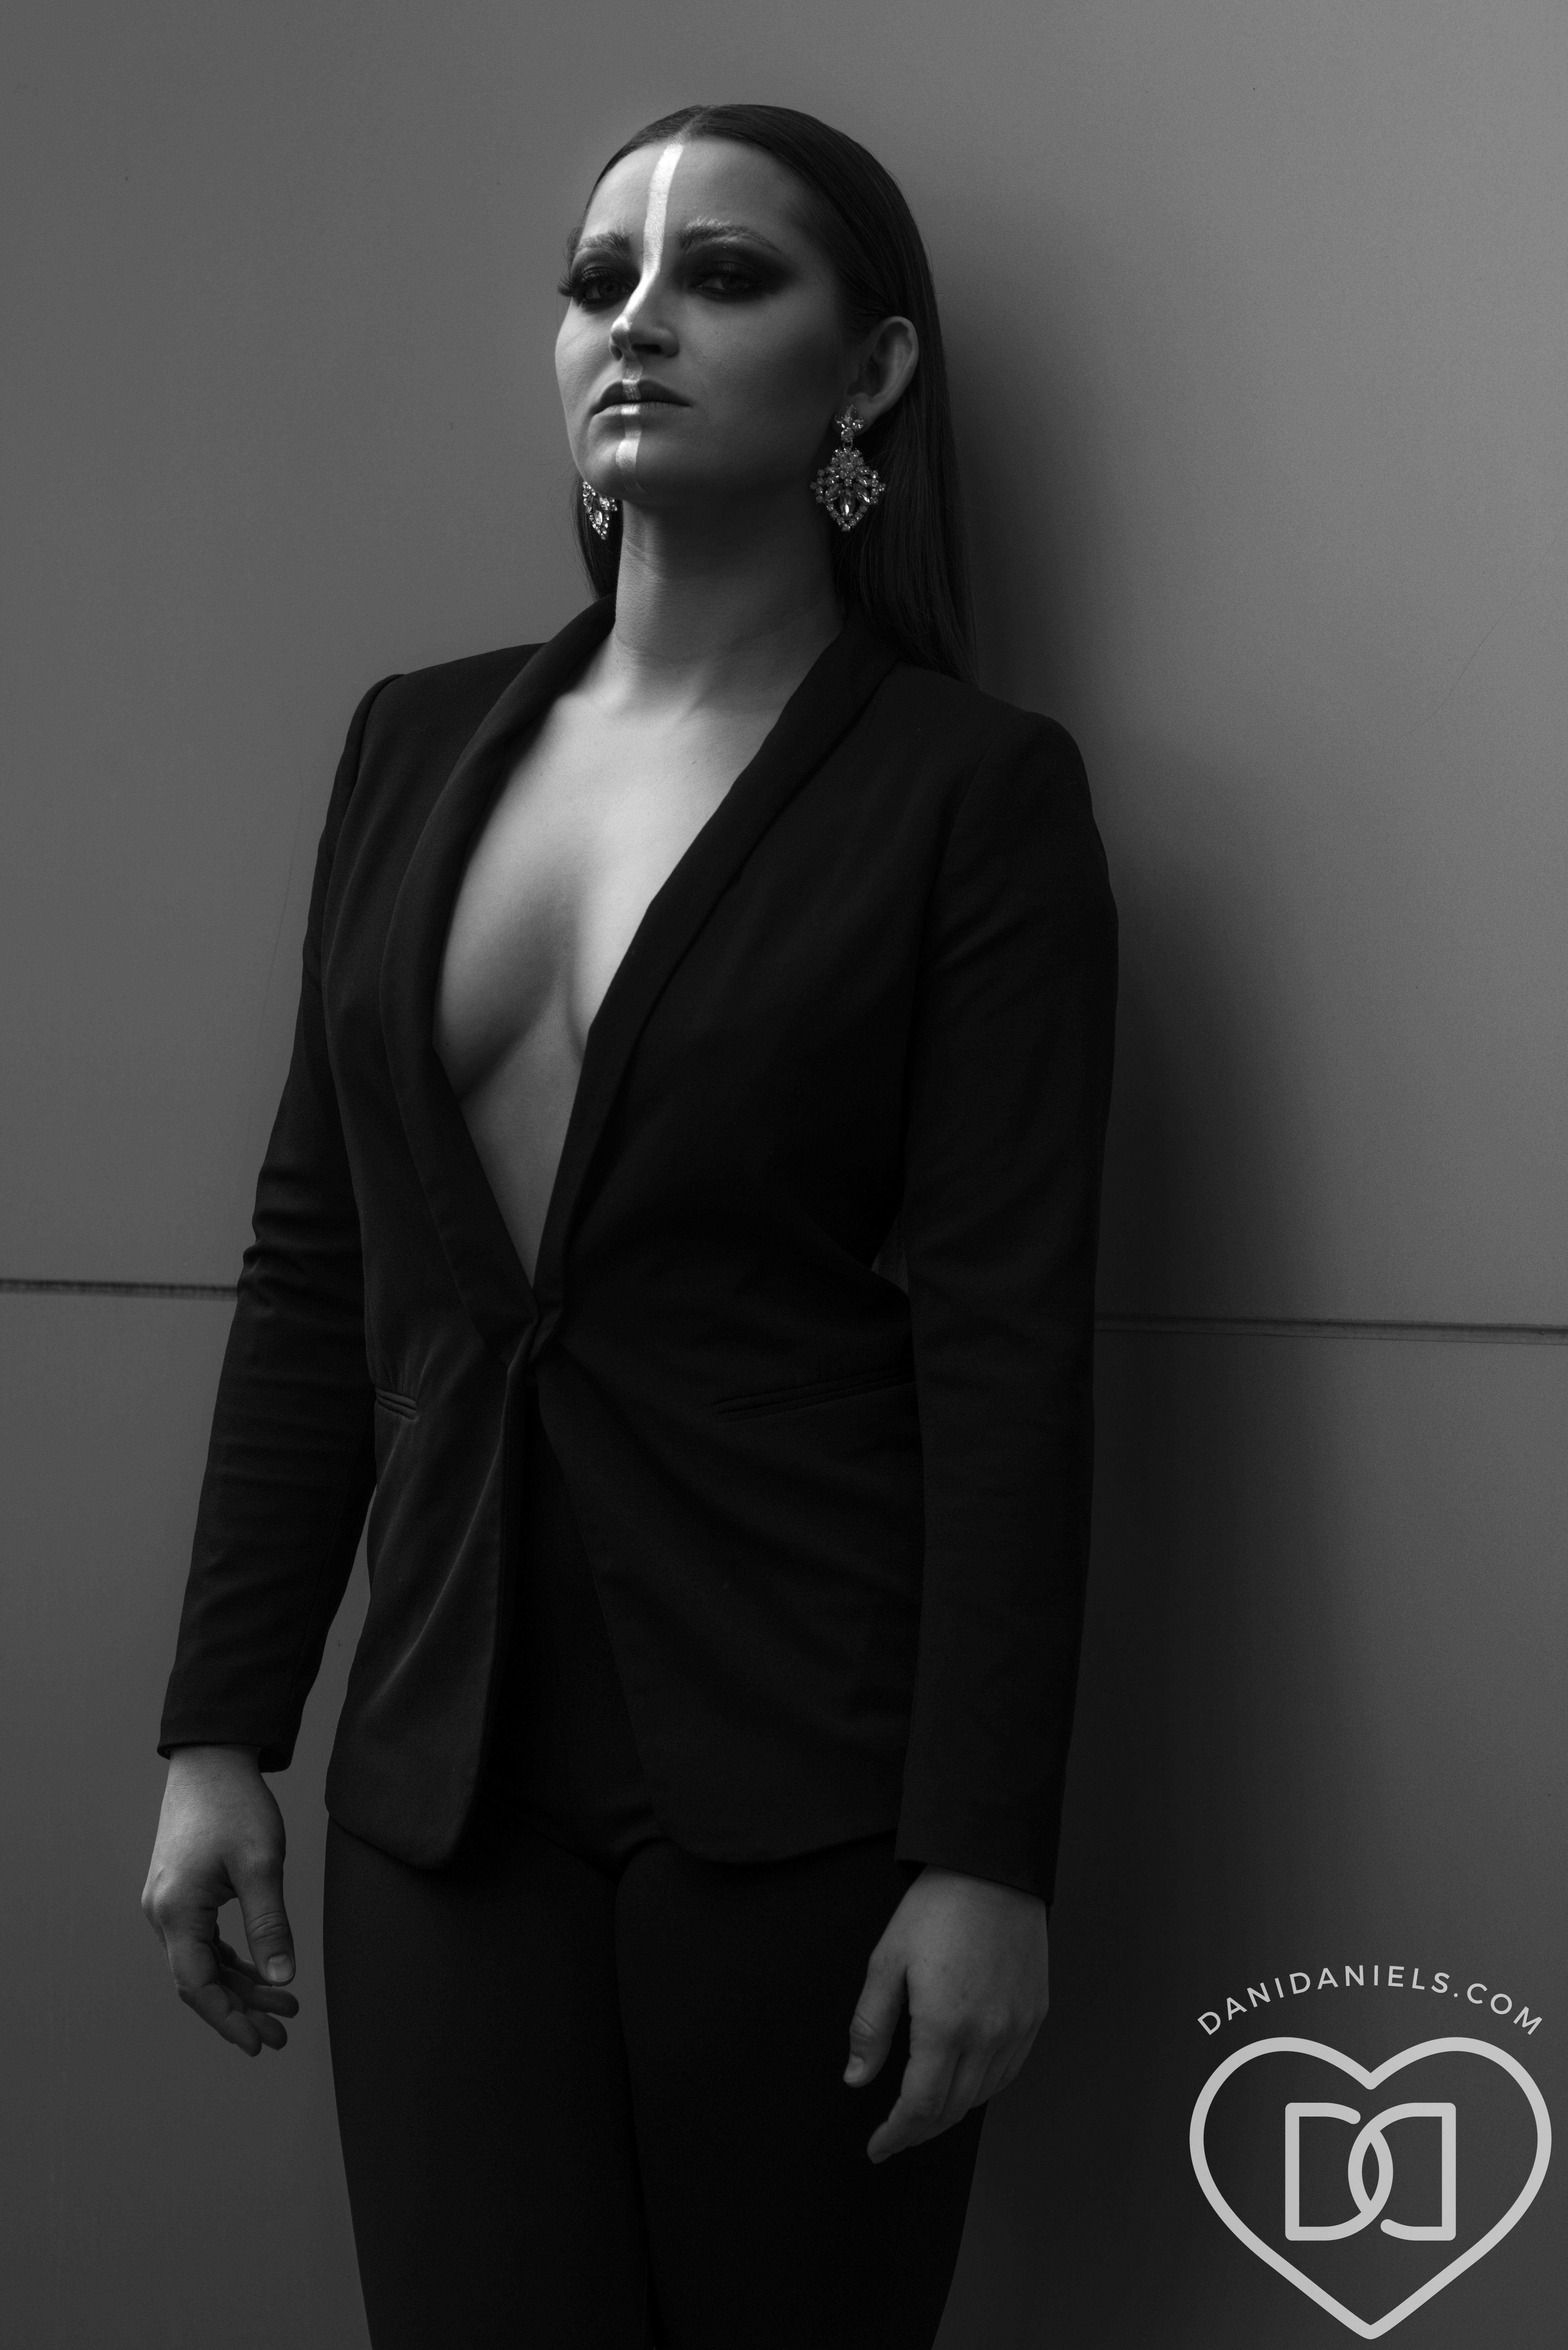 People 4912x7360 Dani Daniels Clinic Magazine model women